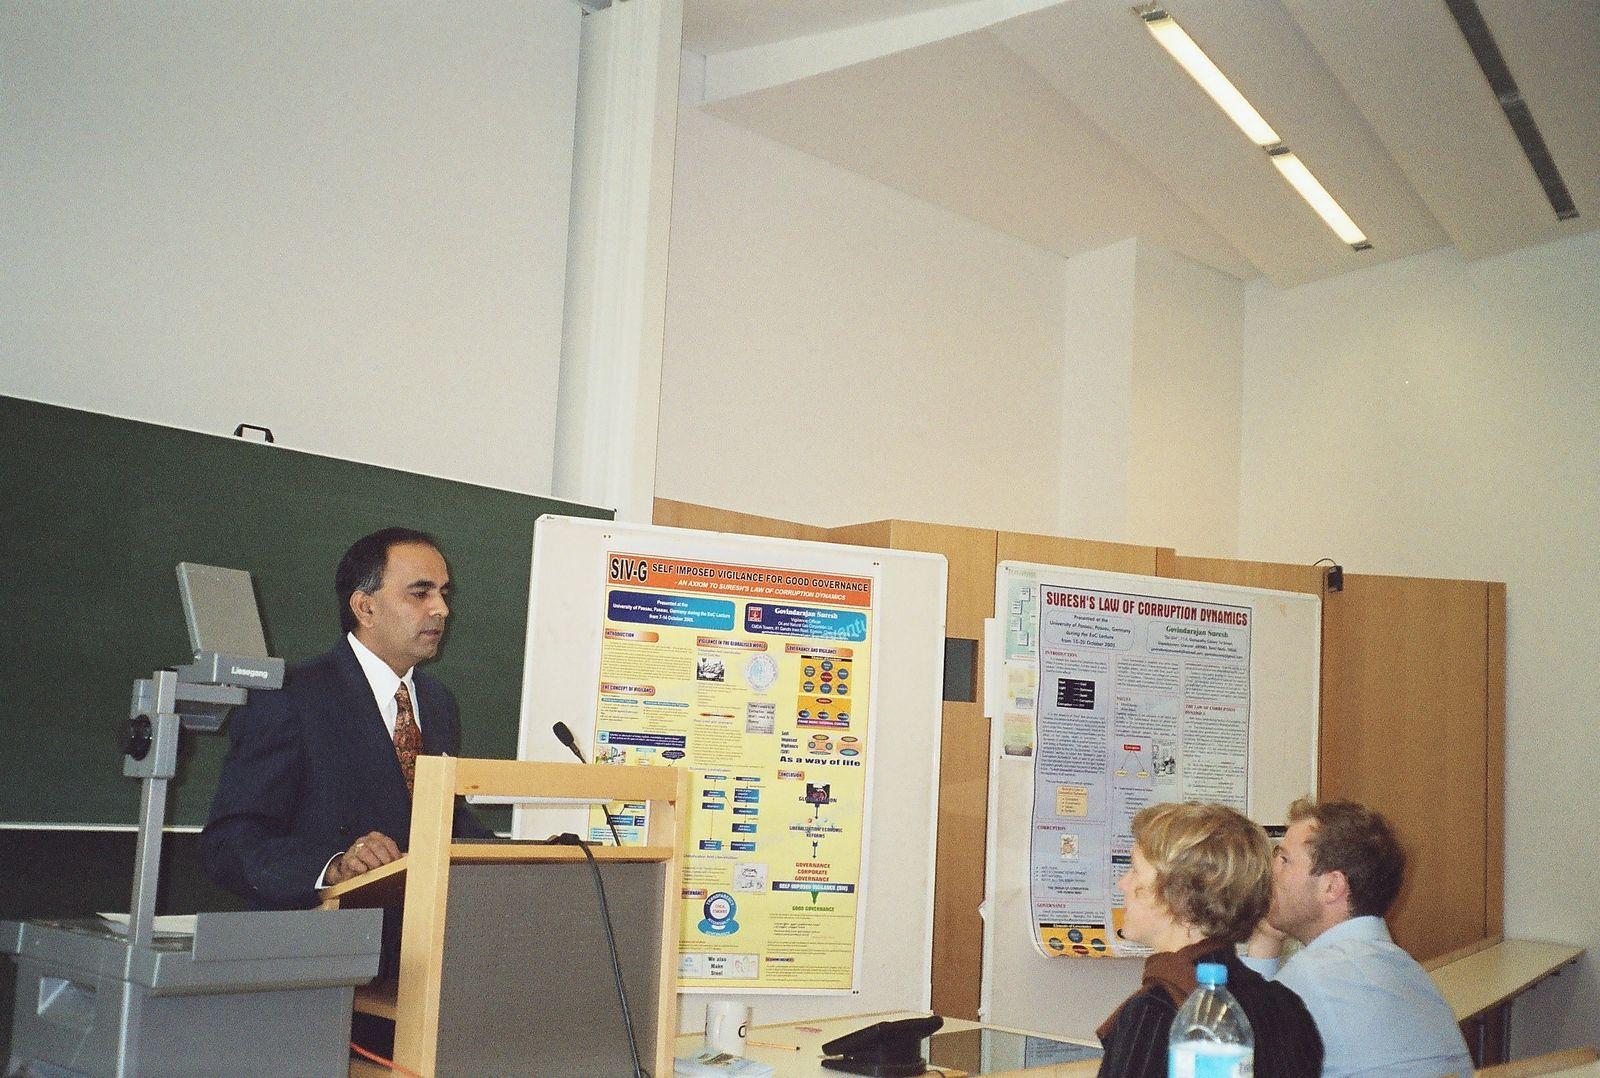 Photo: Govindarajan Suresh - Presenting his concept SIV-G : Self Imposed Vigilance for Good Governance